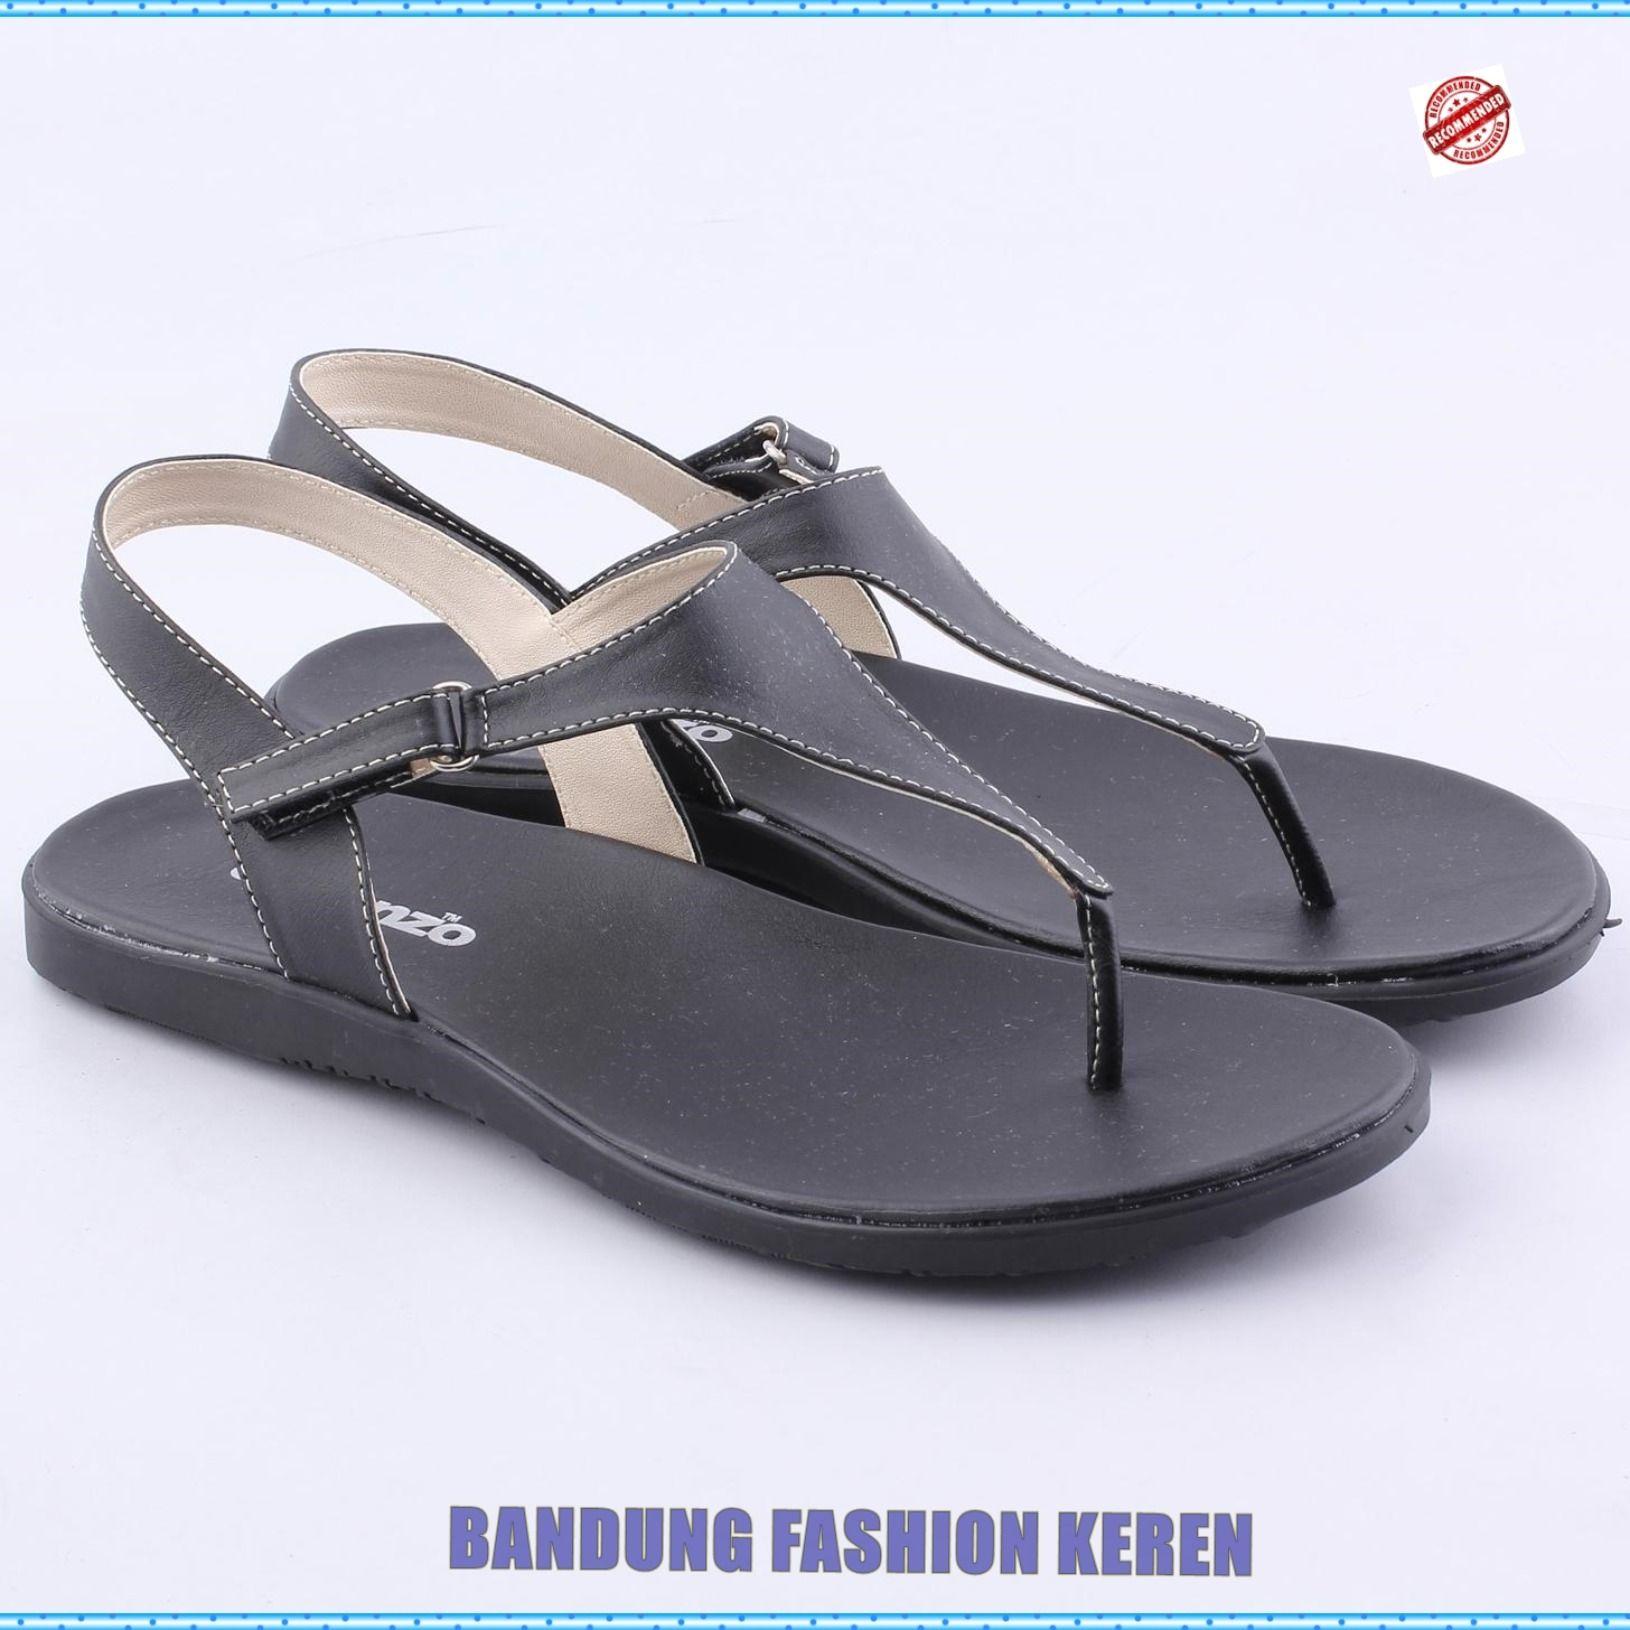 Sandal Casual Wanita Ry 478 Produk Fashion Handmade Terbaik 100